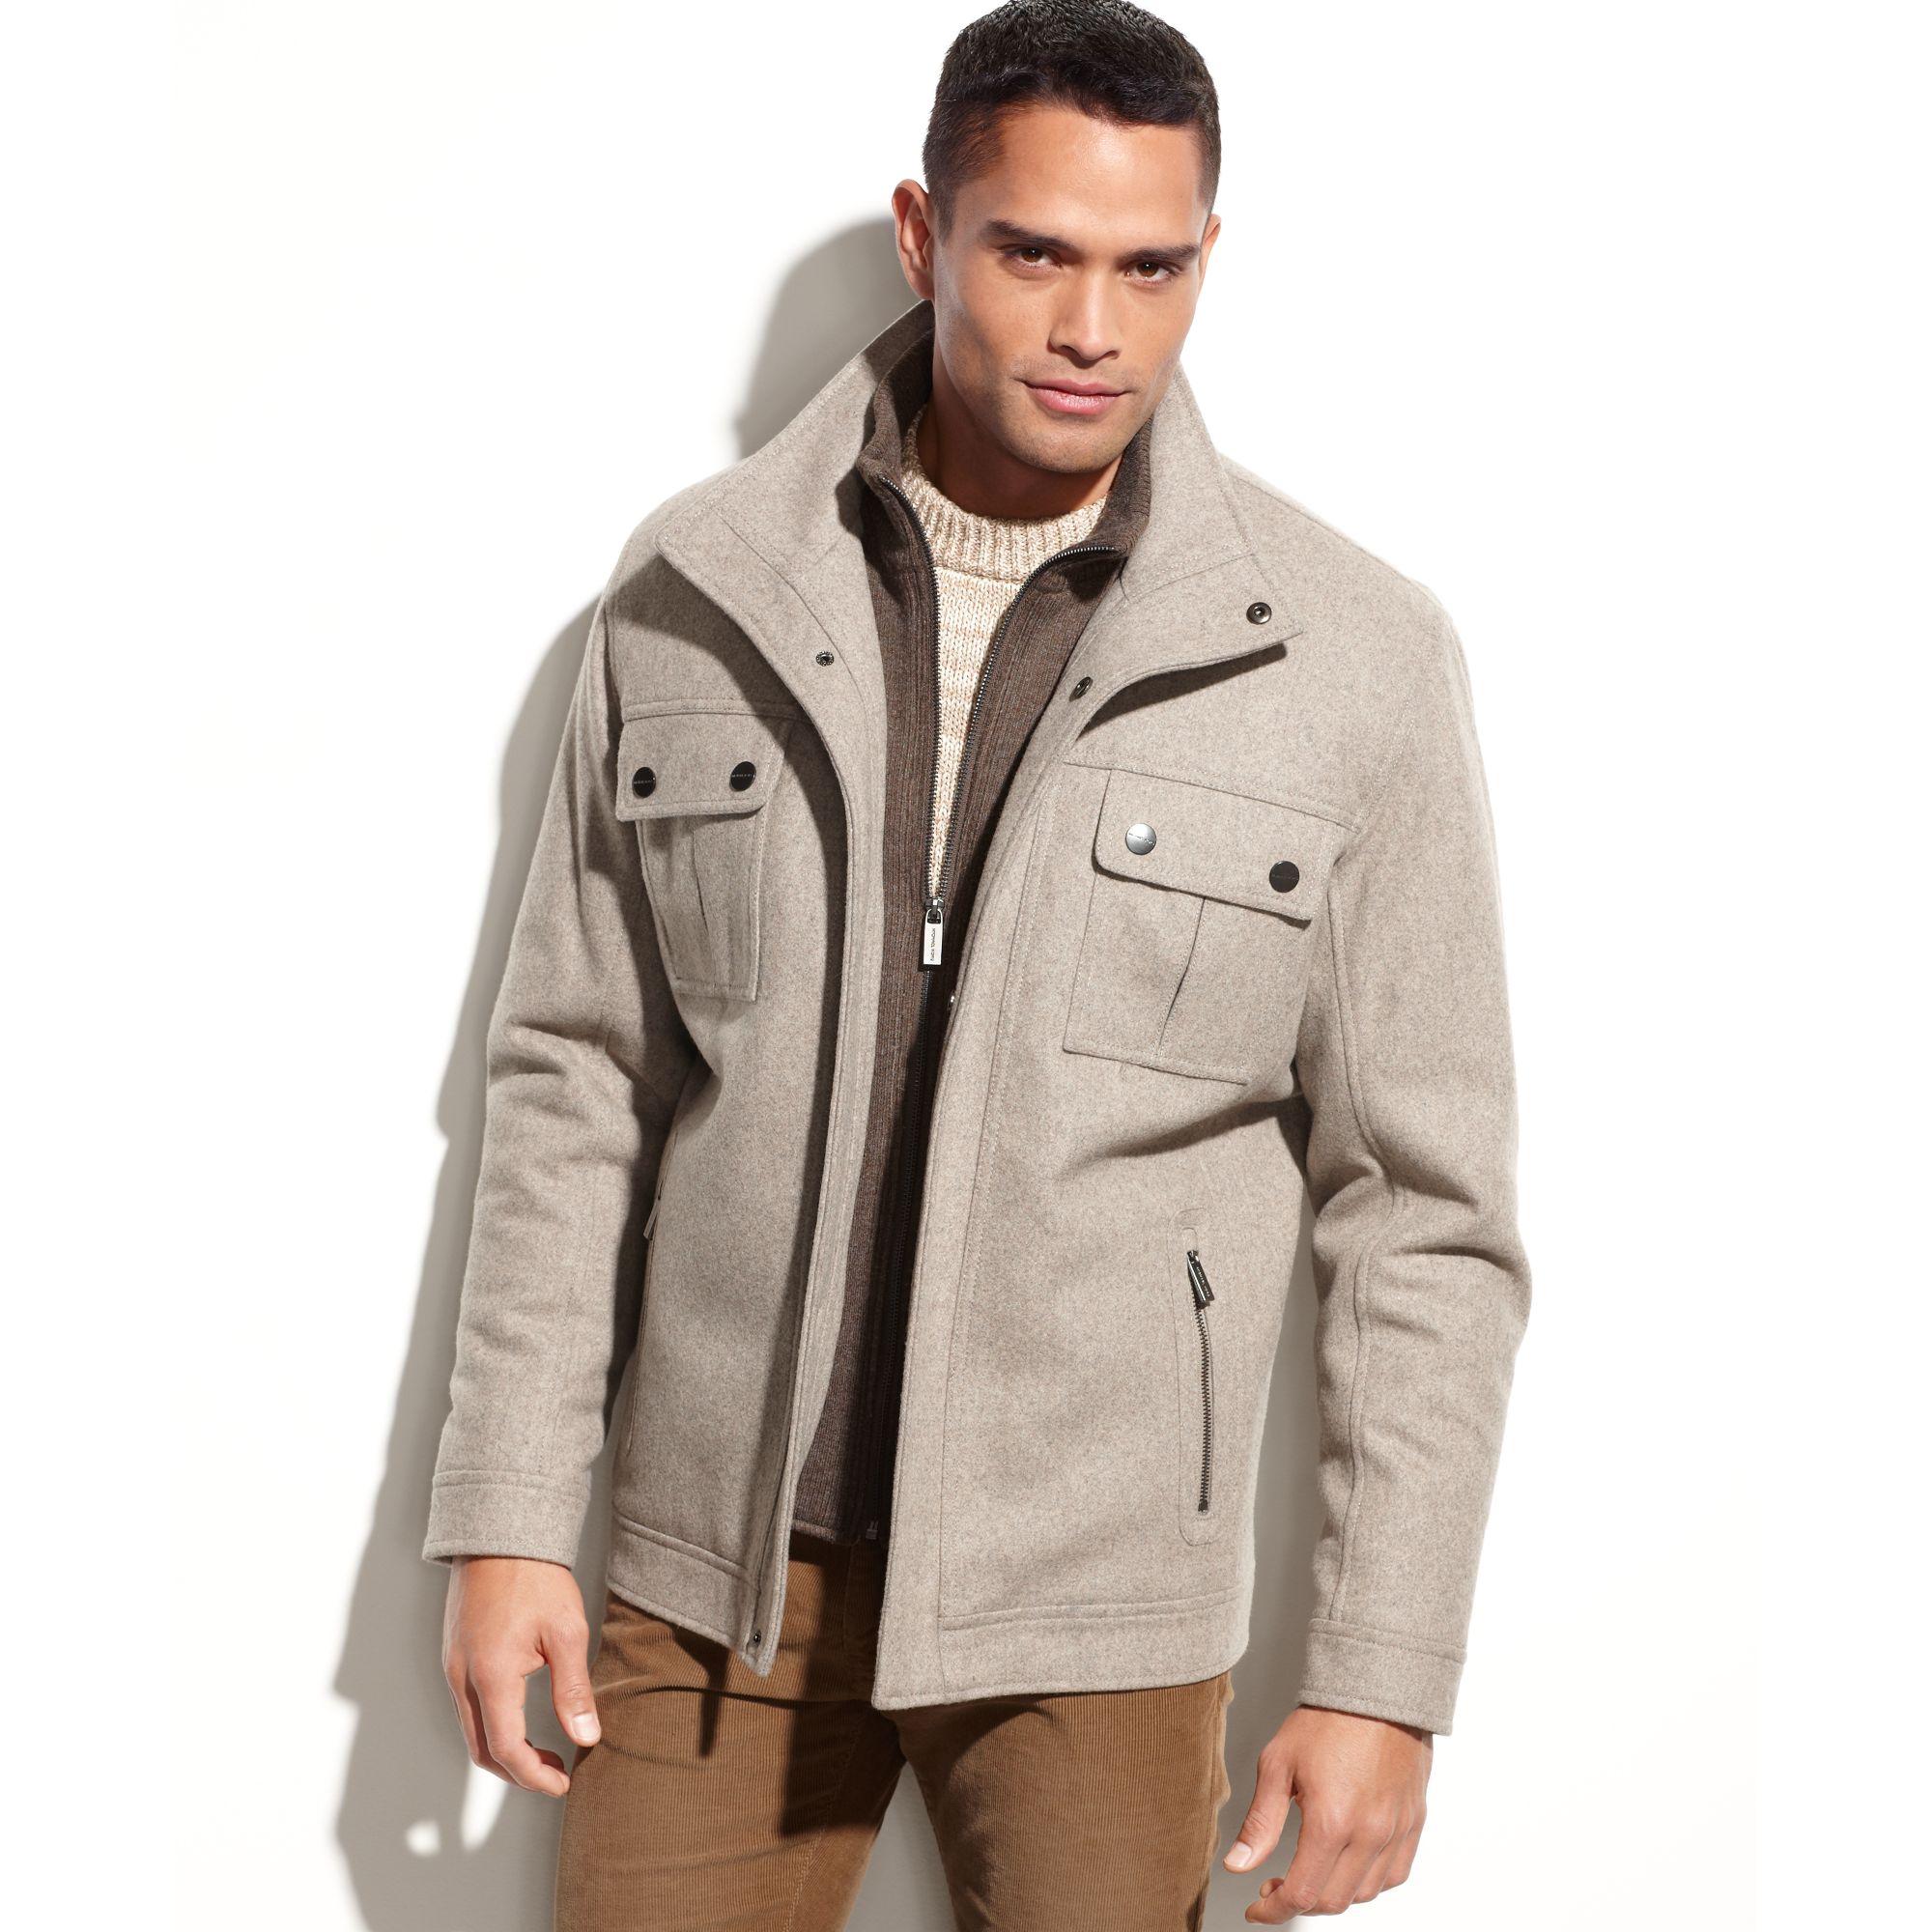 2154705201a8 Lyst - Michael Kors Alhambra Wool-blend Knit Bib Coat in Natural for Men